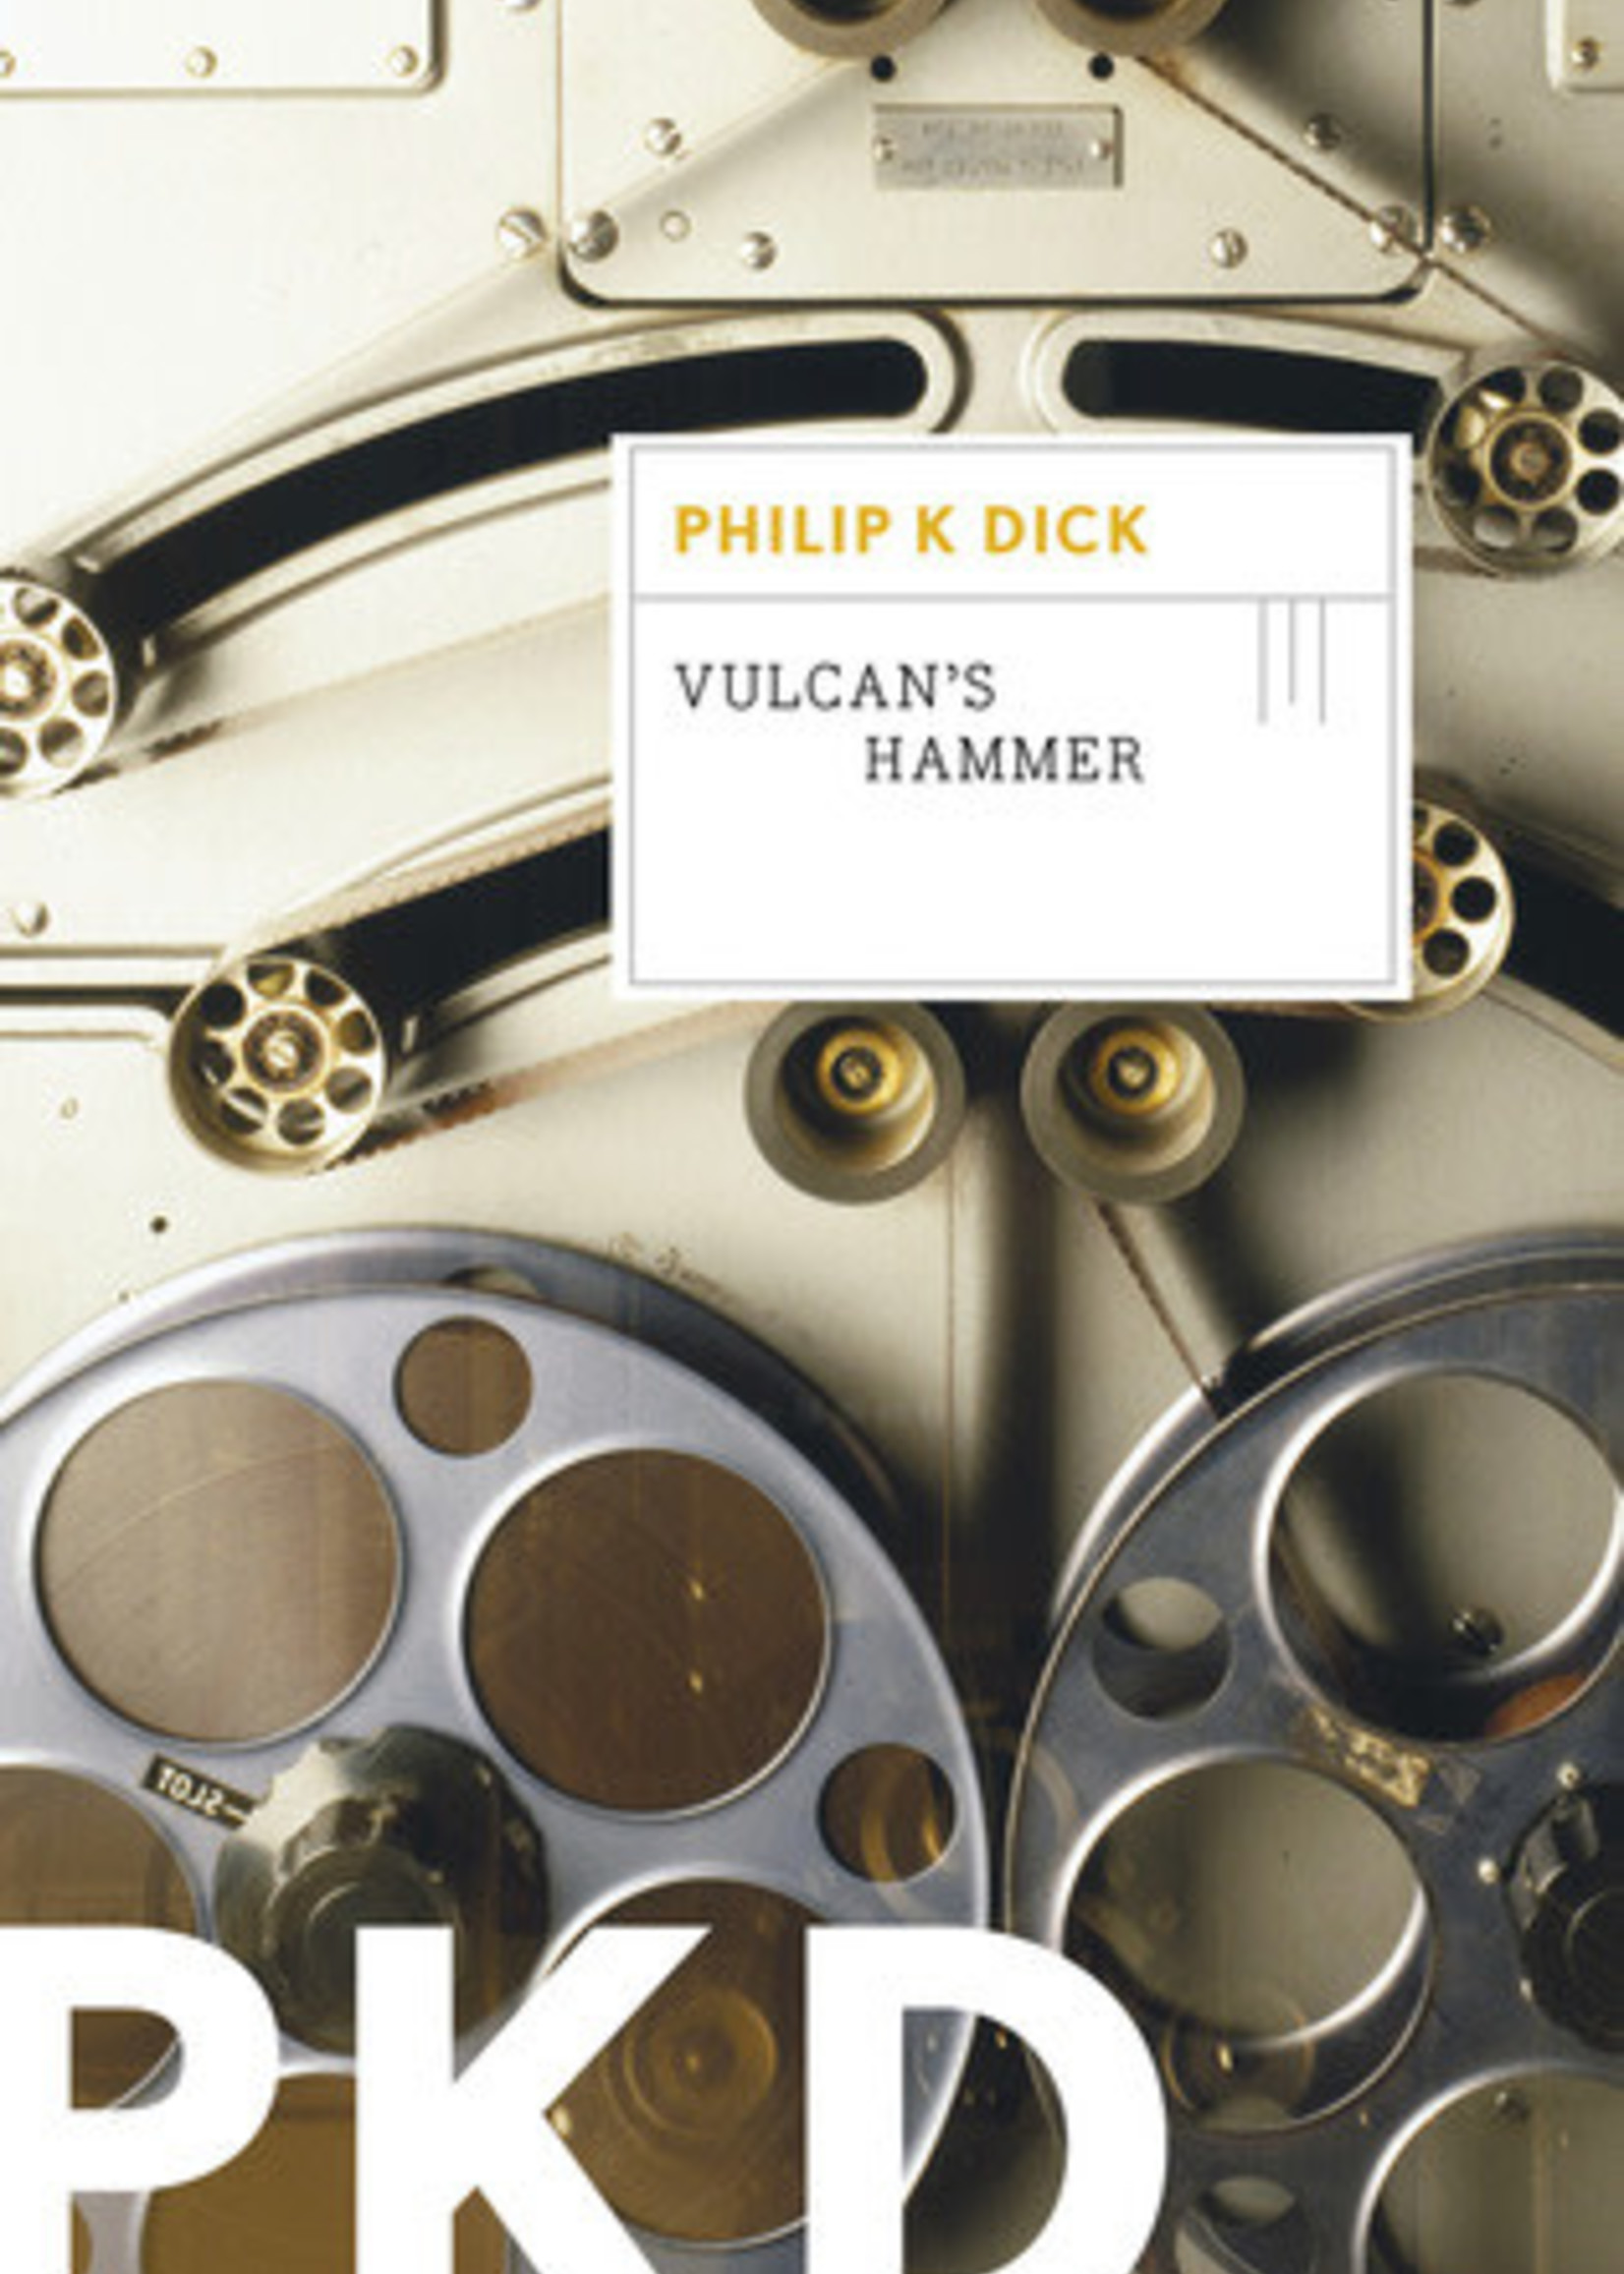 Vulcan's Hammer by Philip K. Dick